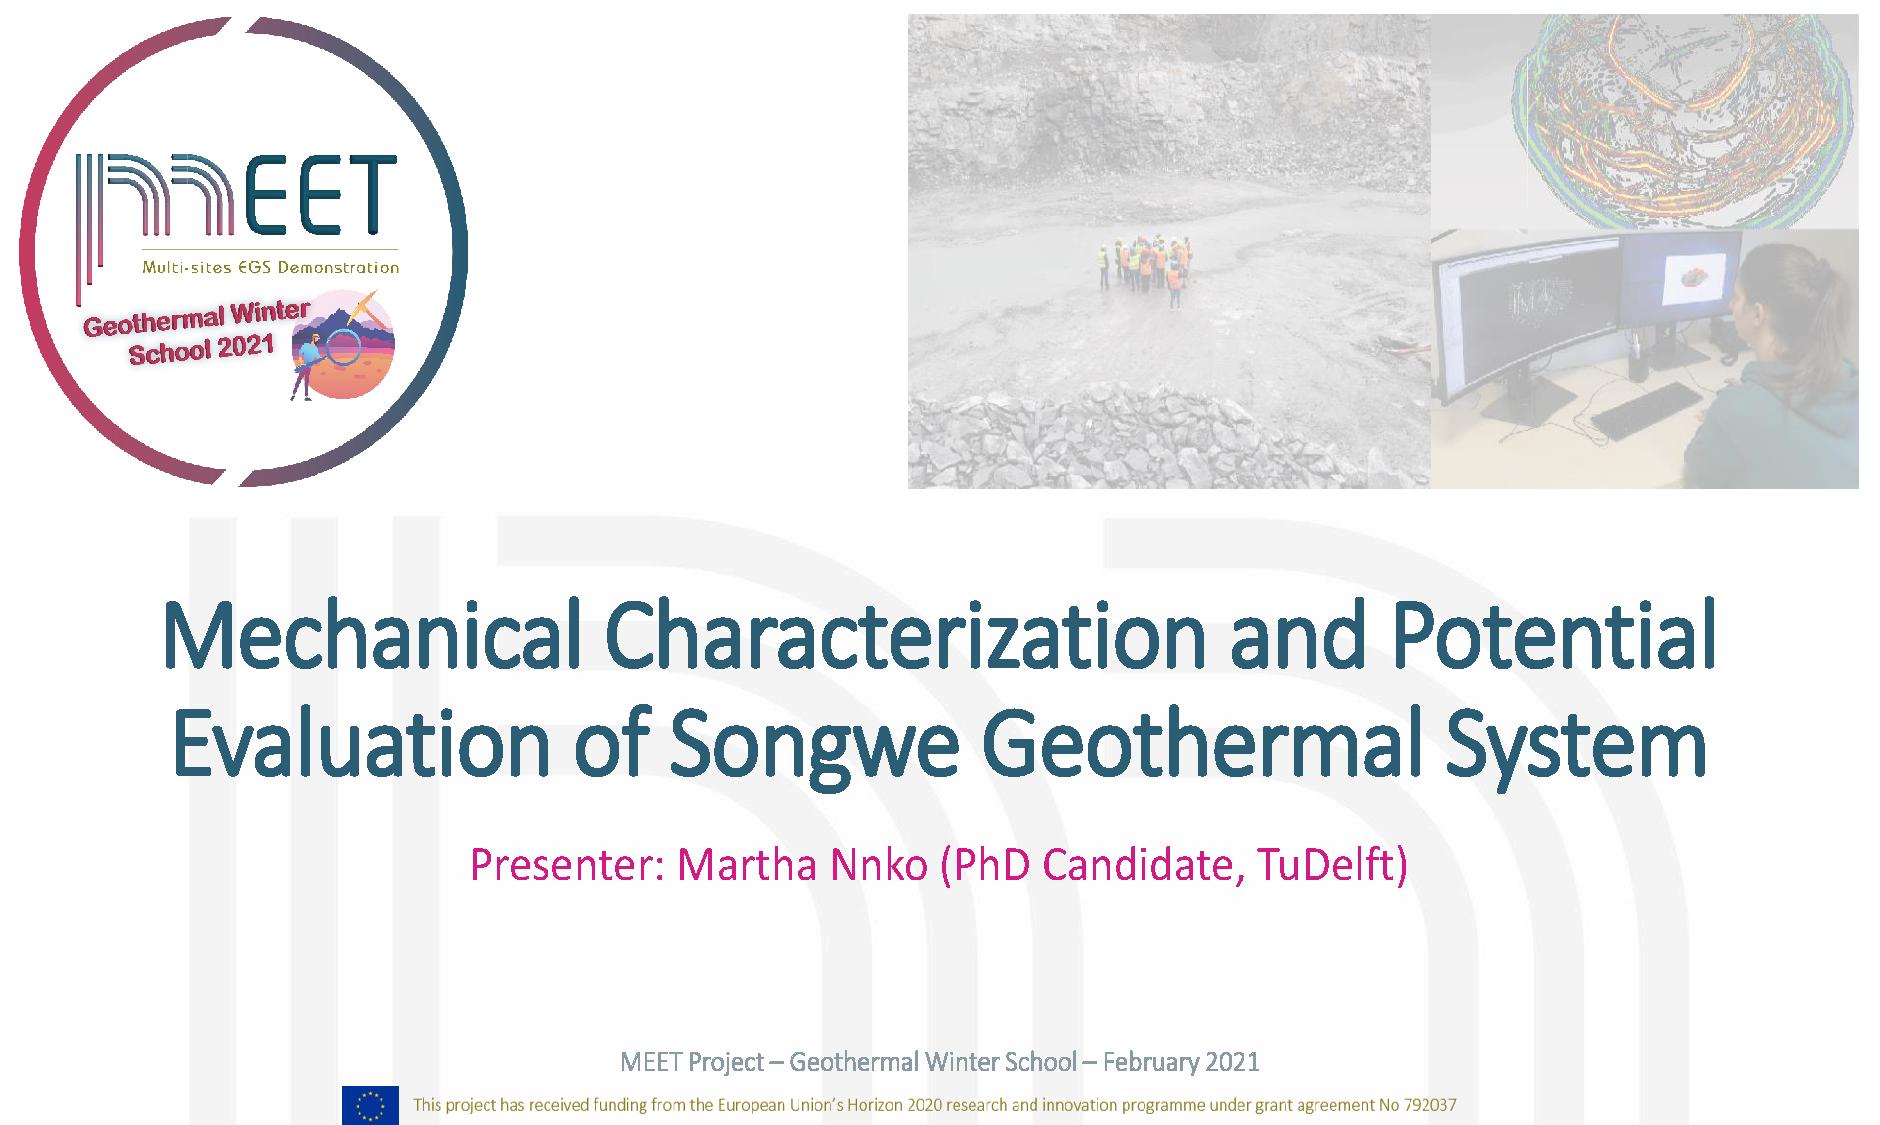 MEET Geothermal Winter School Martha Nnko first slide visual